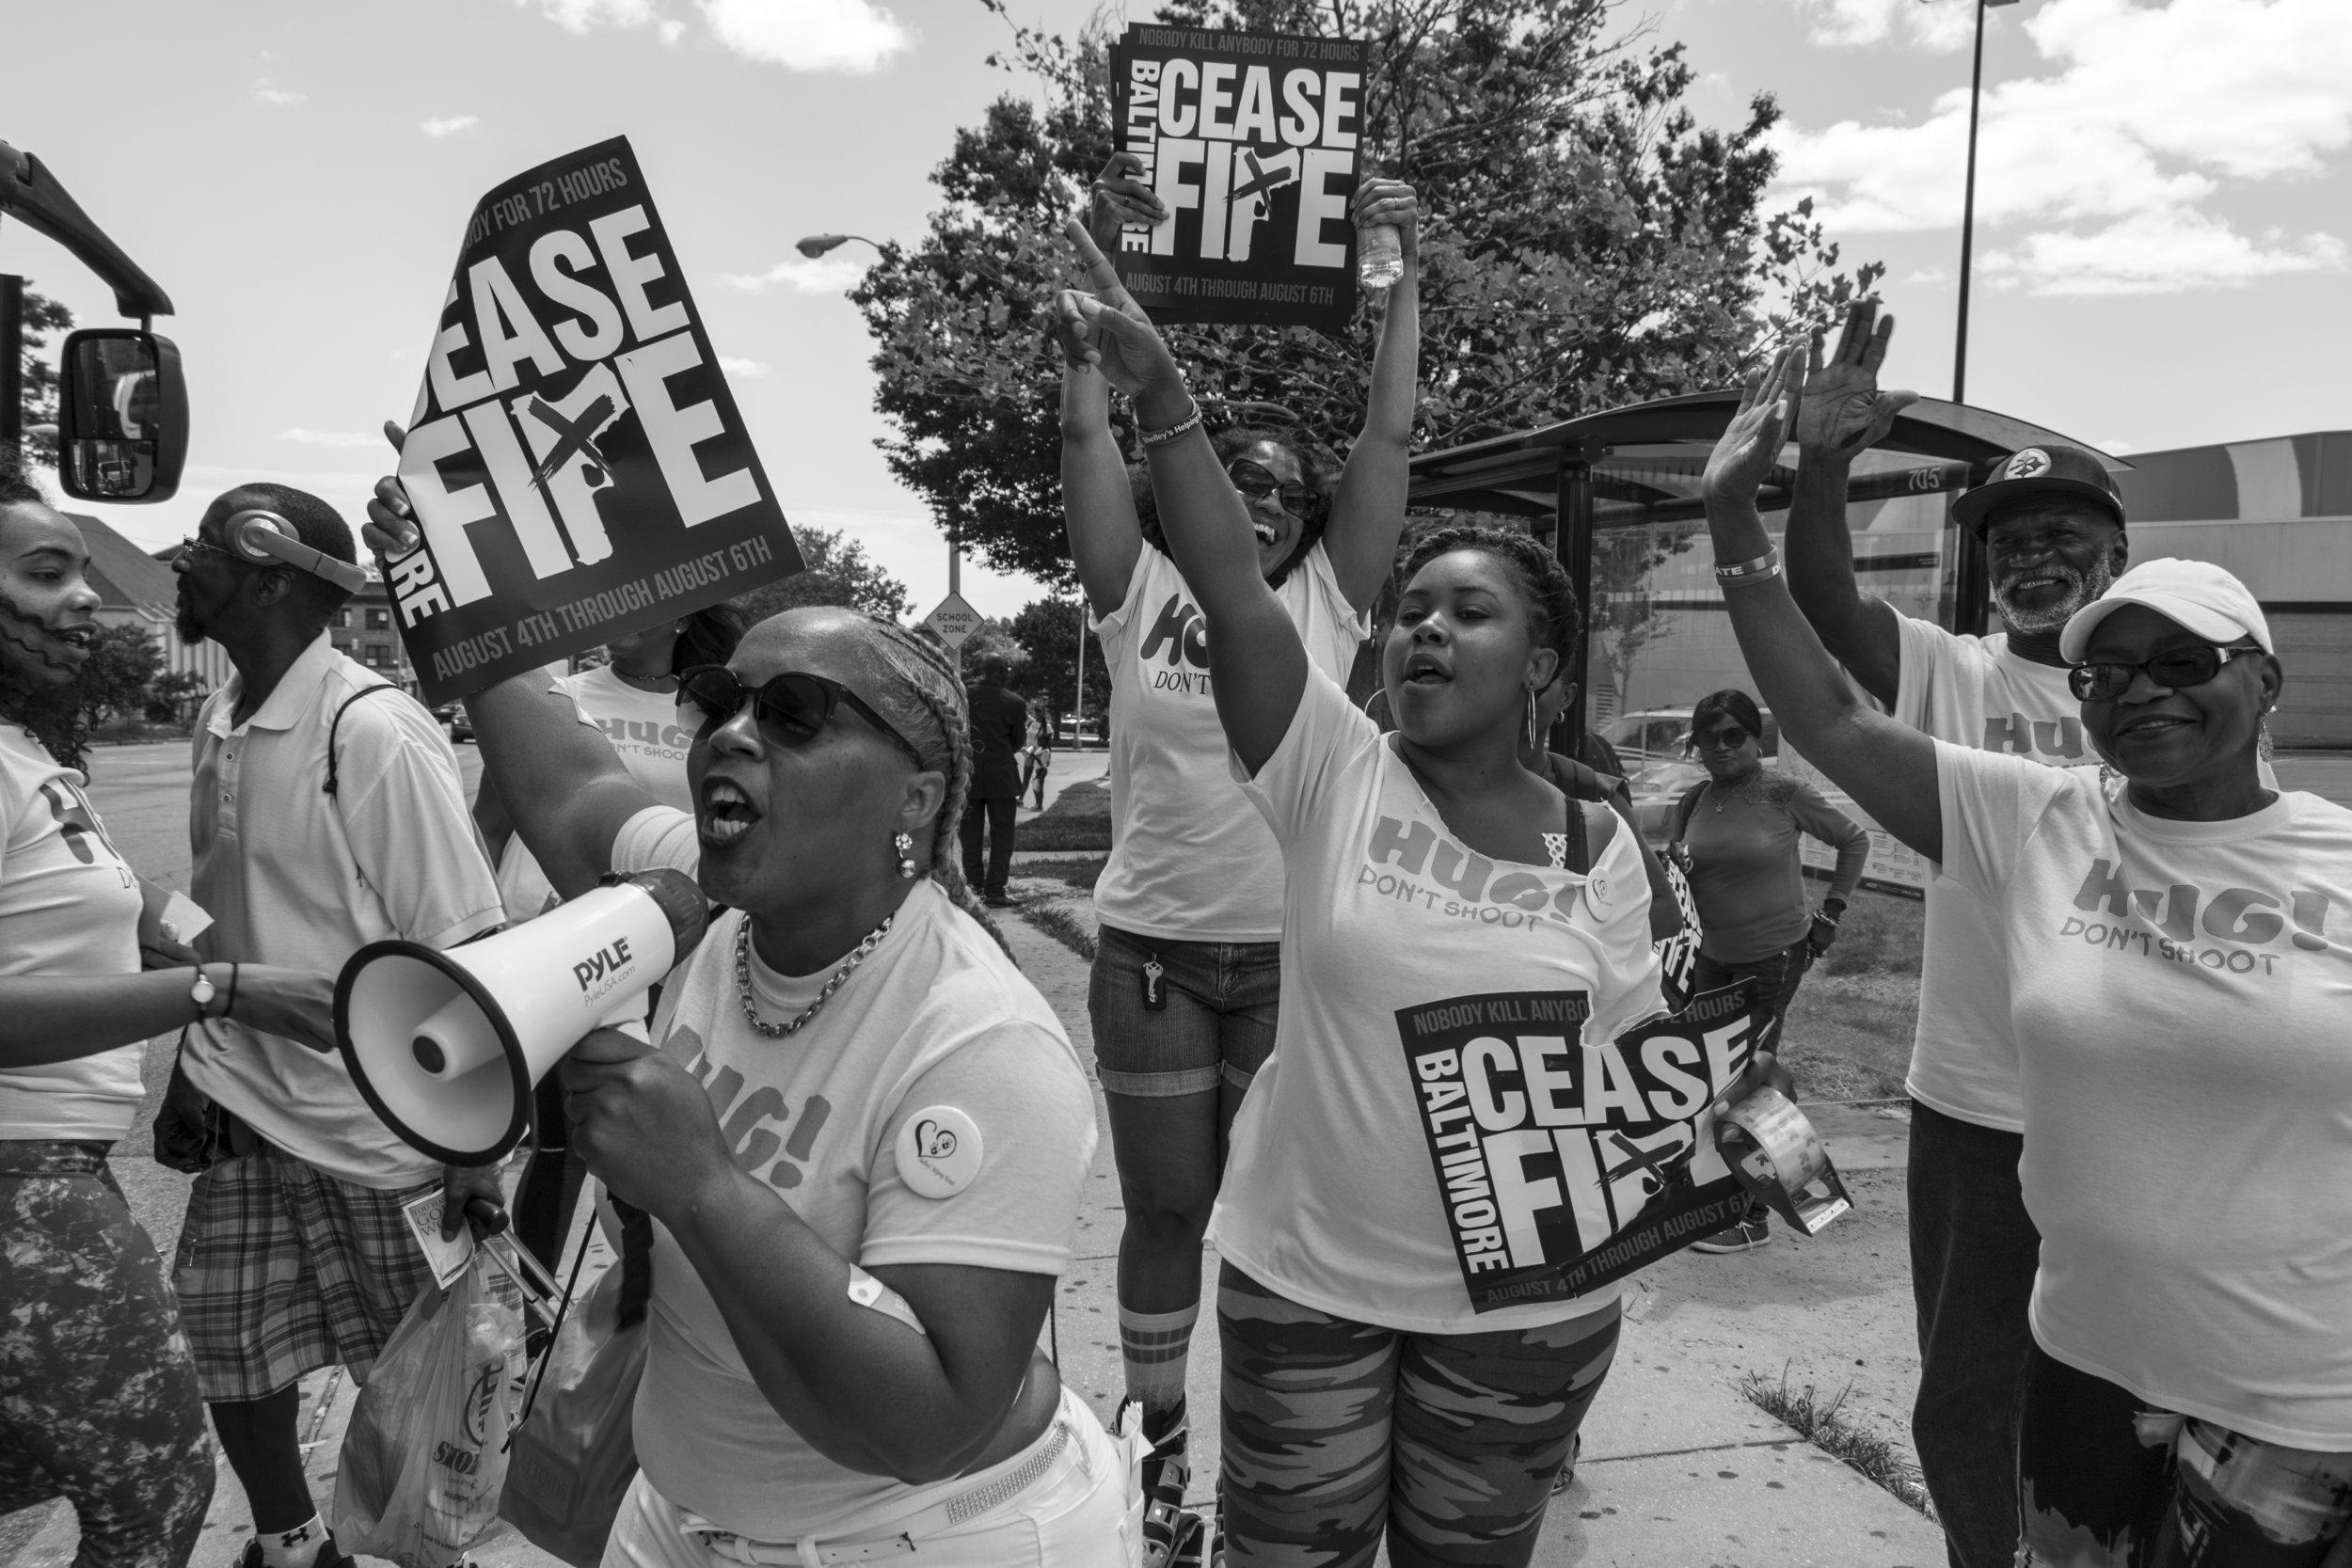 BaltimoreCeasefire2017_Lai_011.JPG